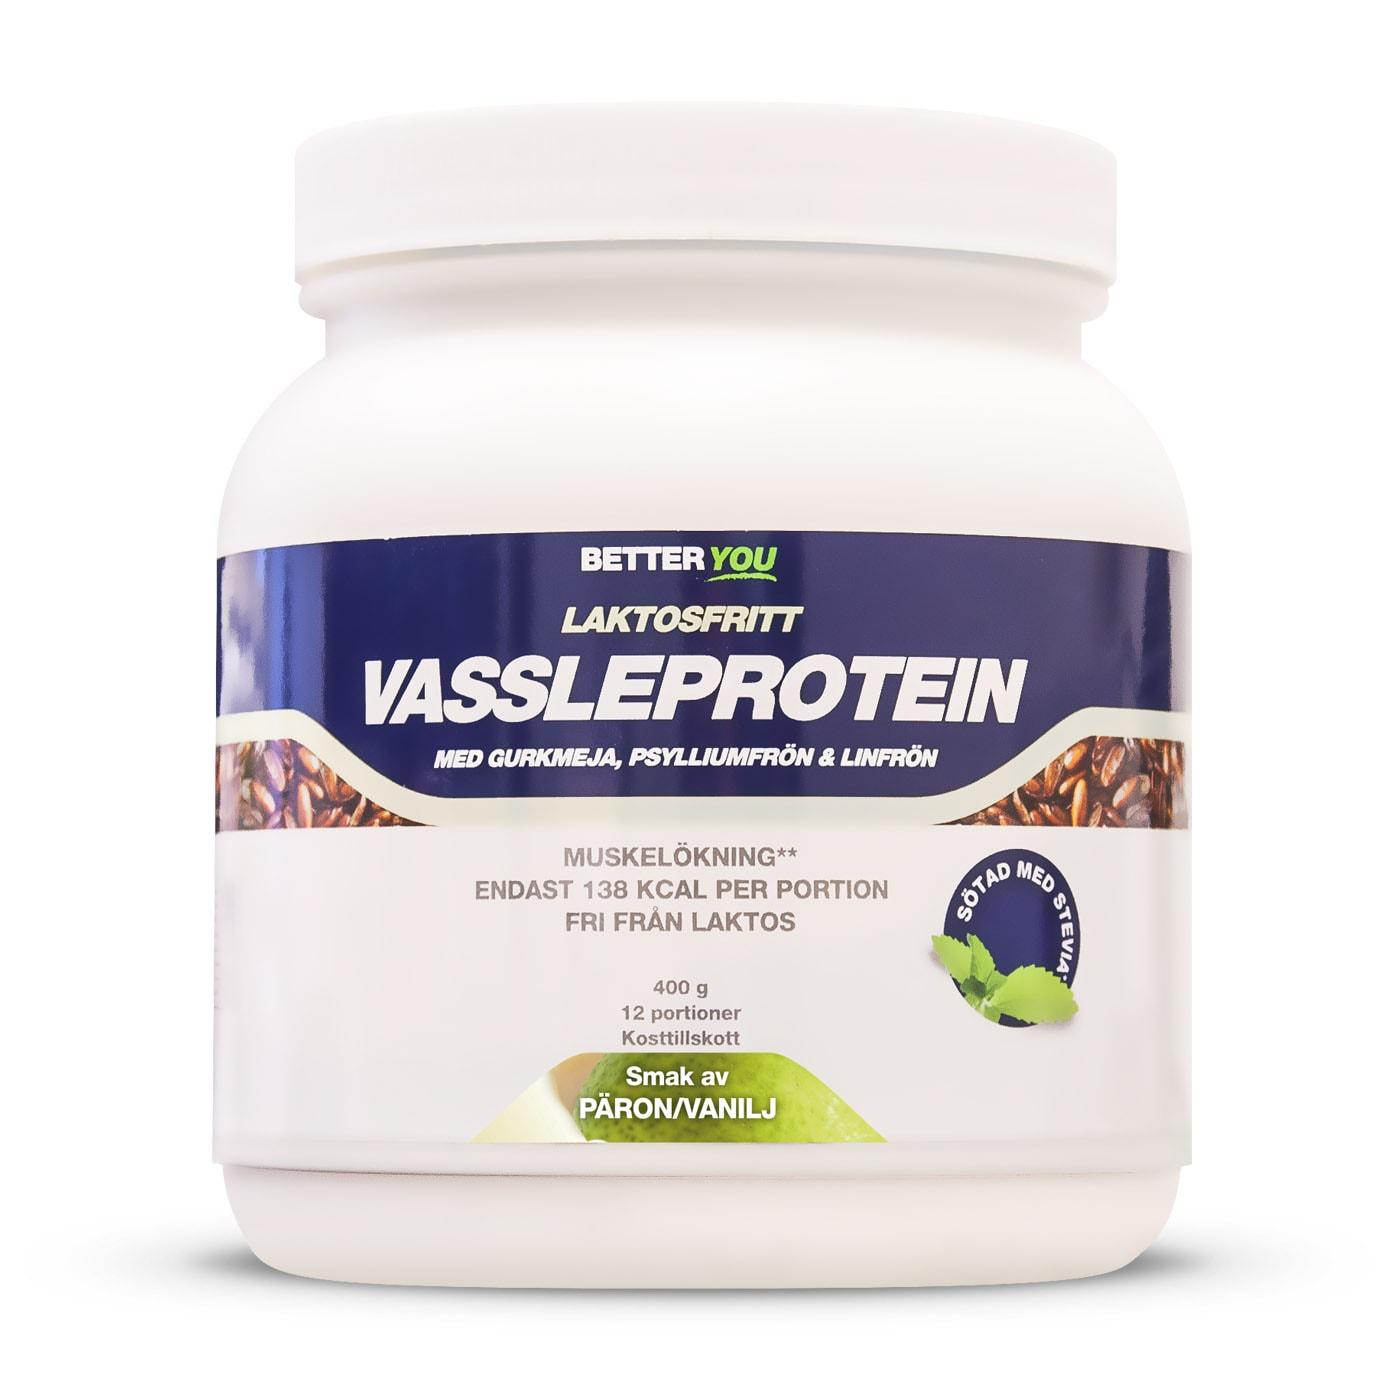 proteinpulver päron vanilj